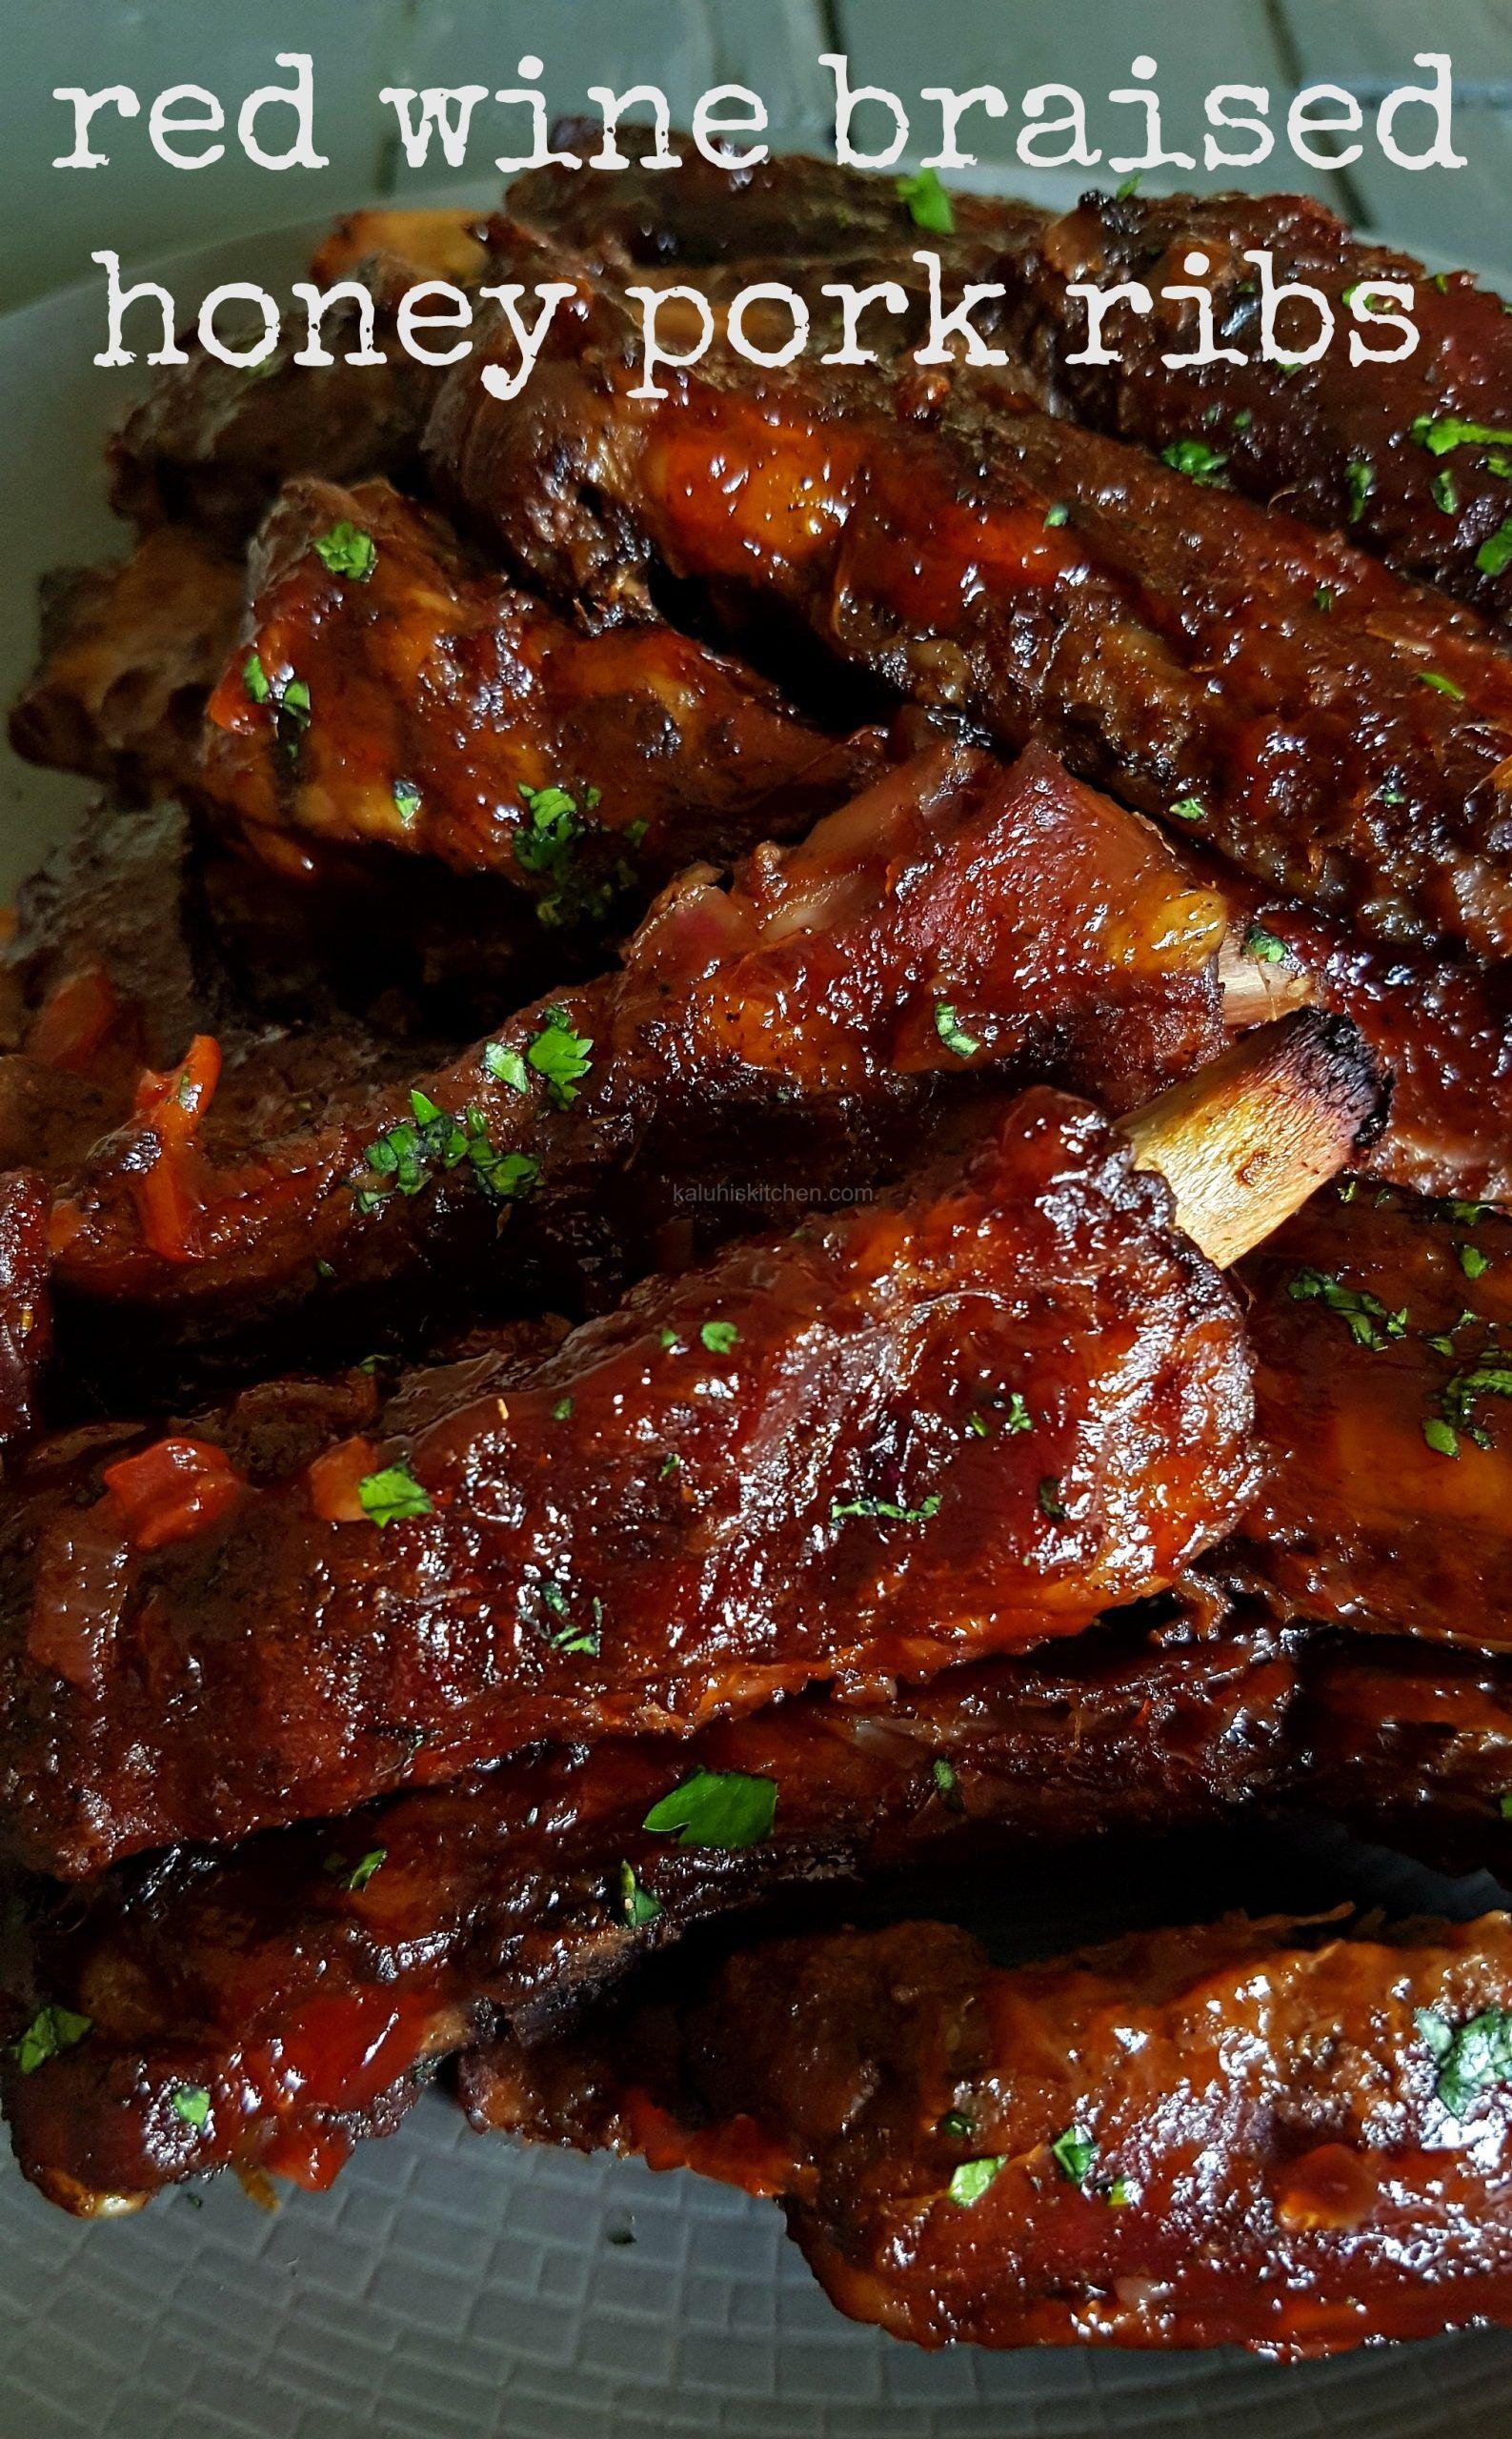 Red Wine Braised Honey Pork Ribs Braised Pork Ribs Pork Ribs Pork Rib Recipes